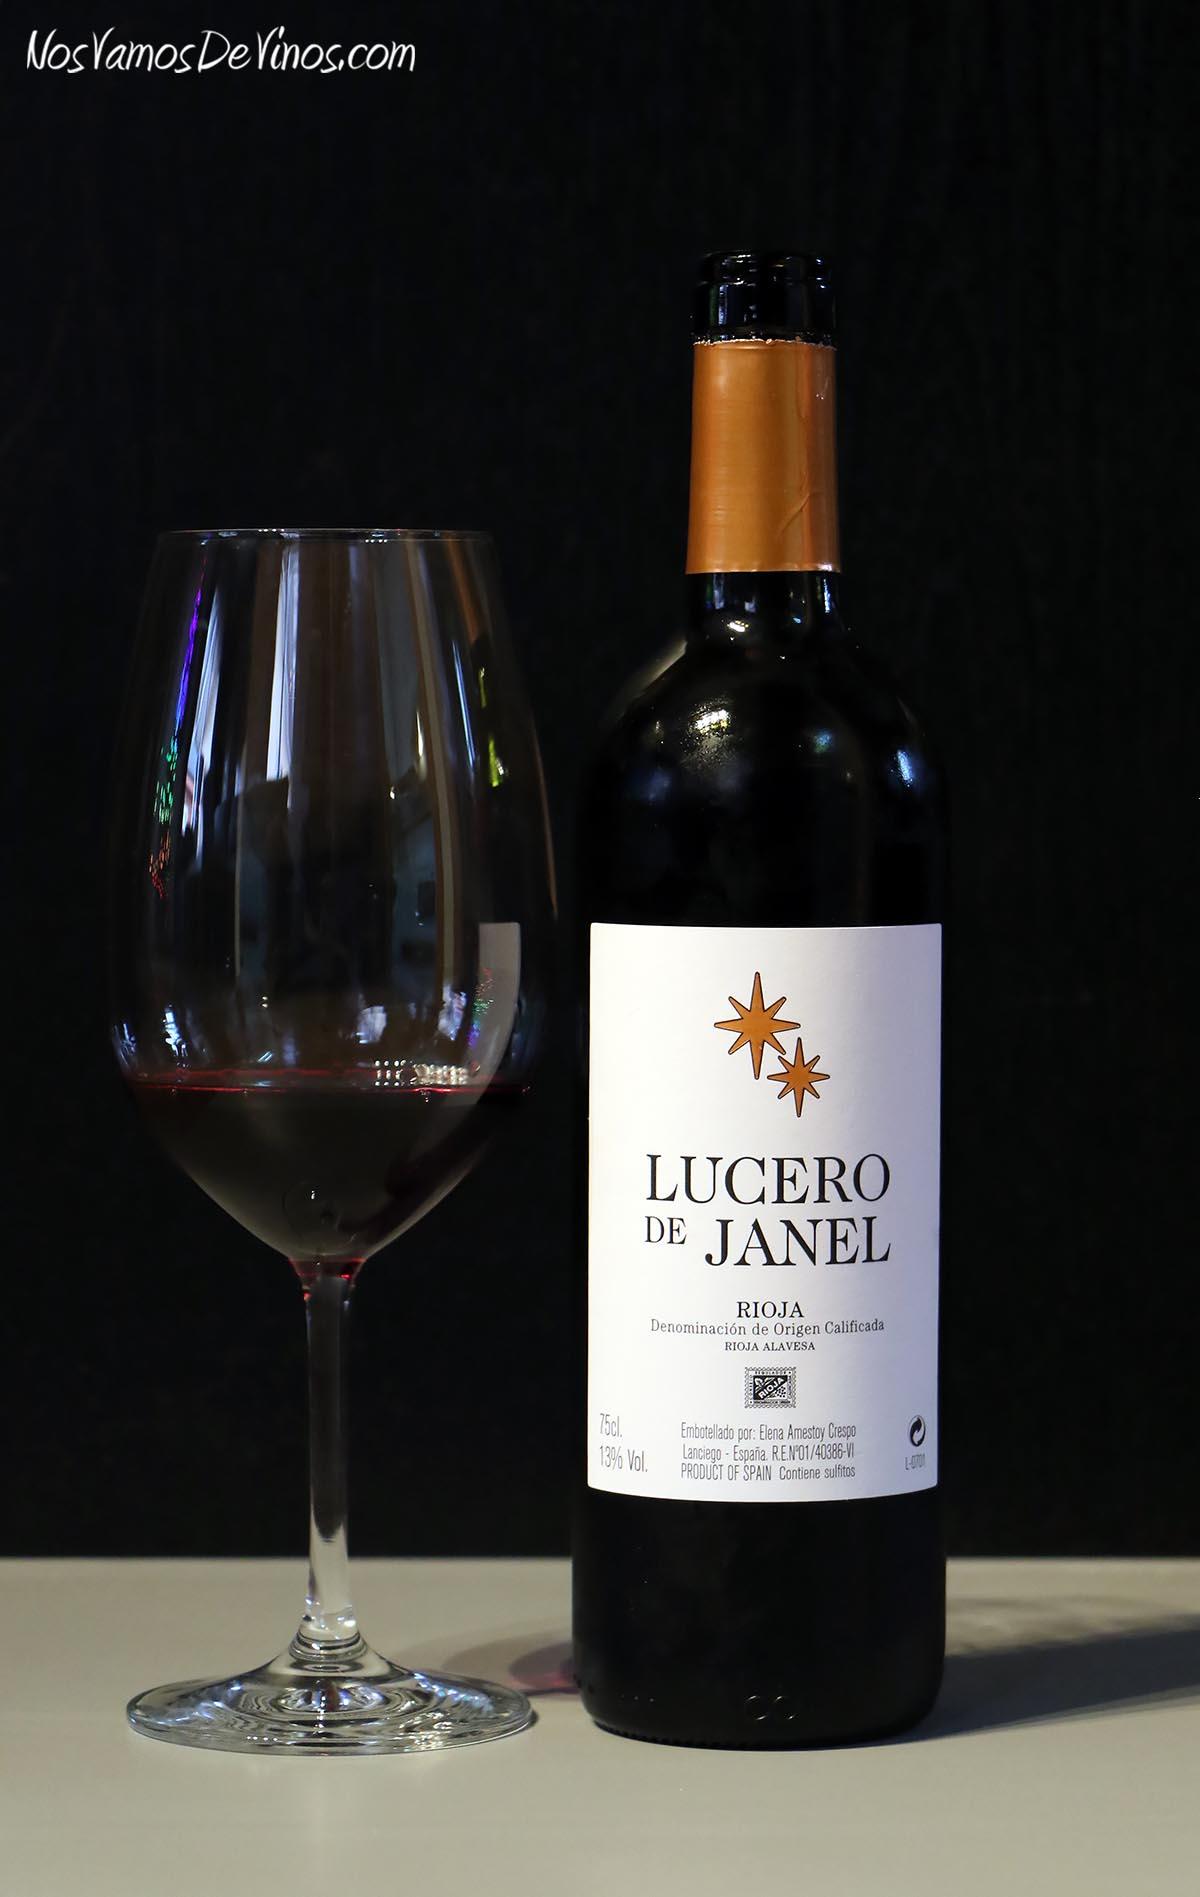 Lucero de Janel 2019